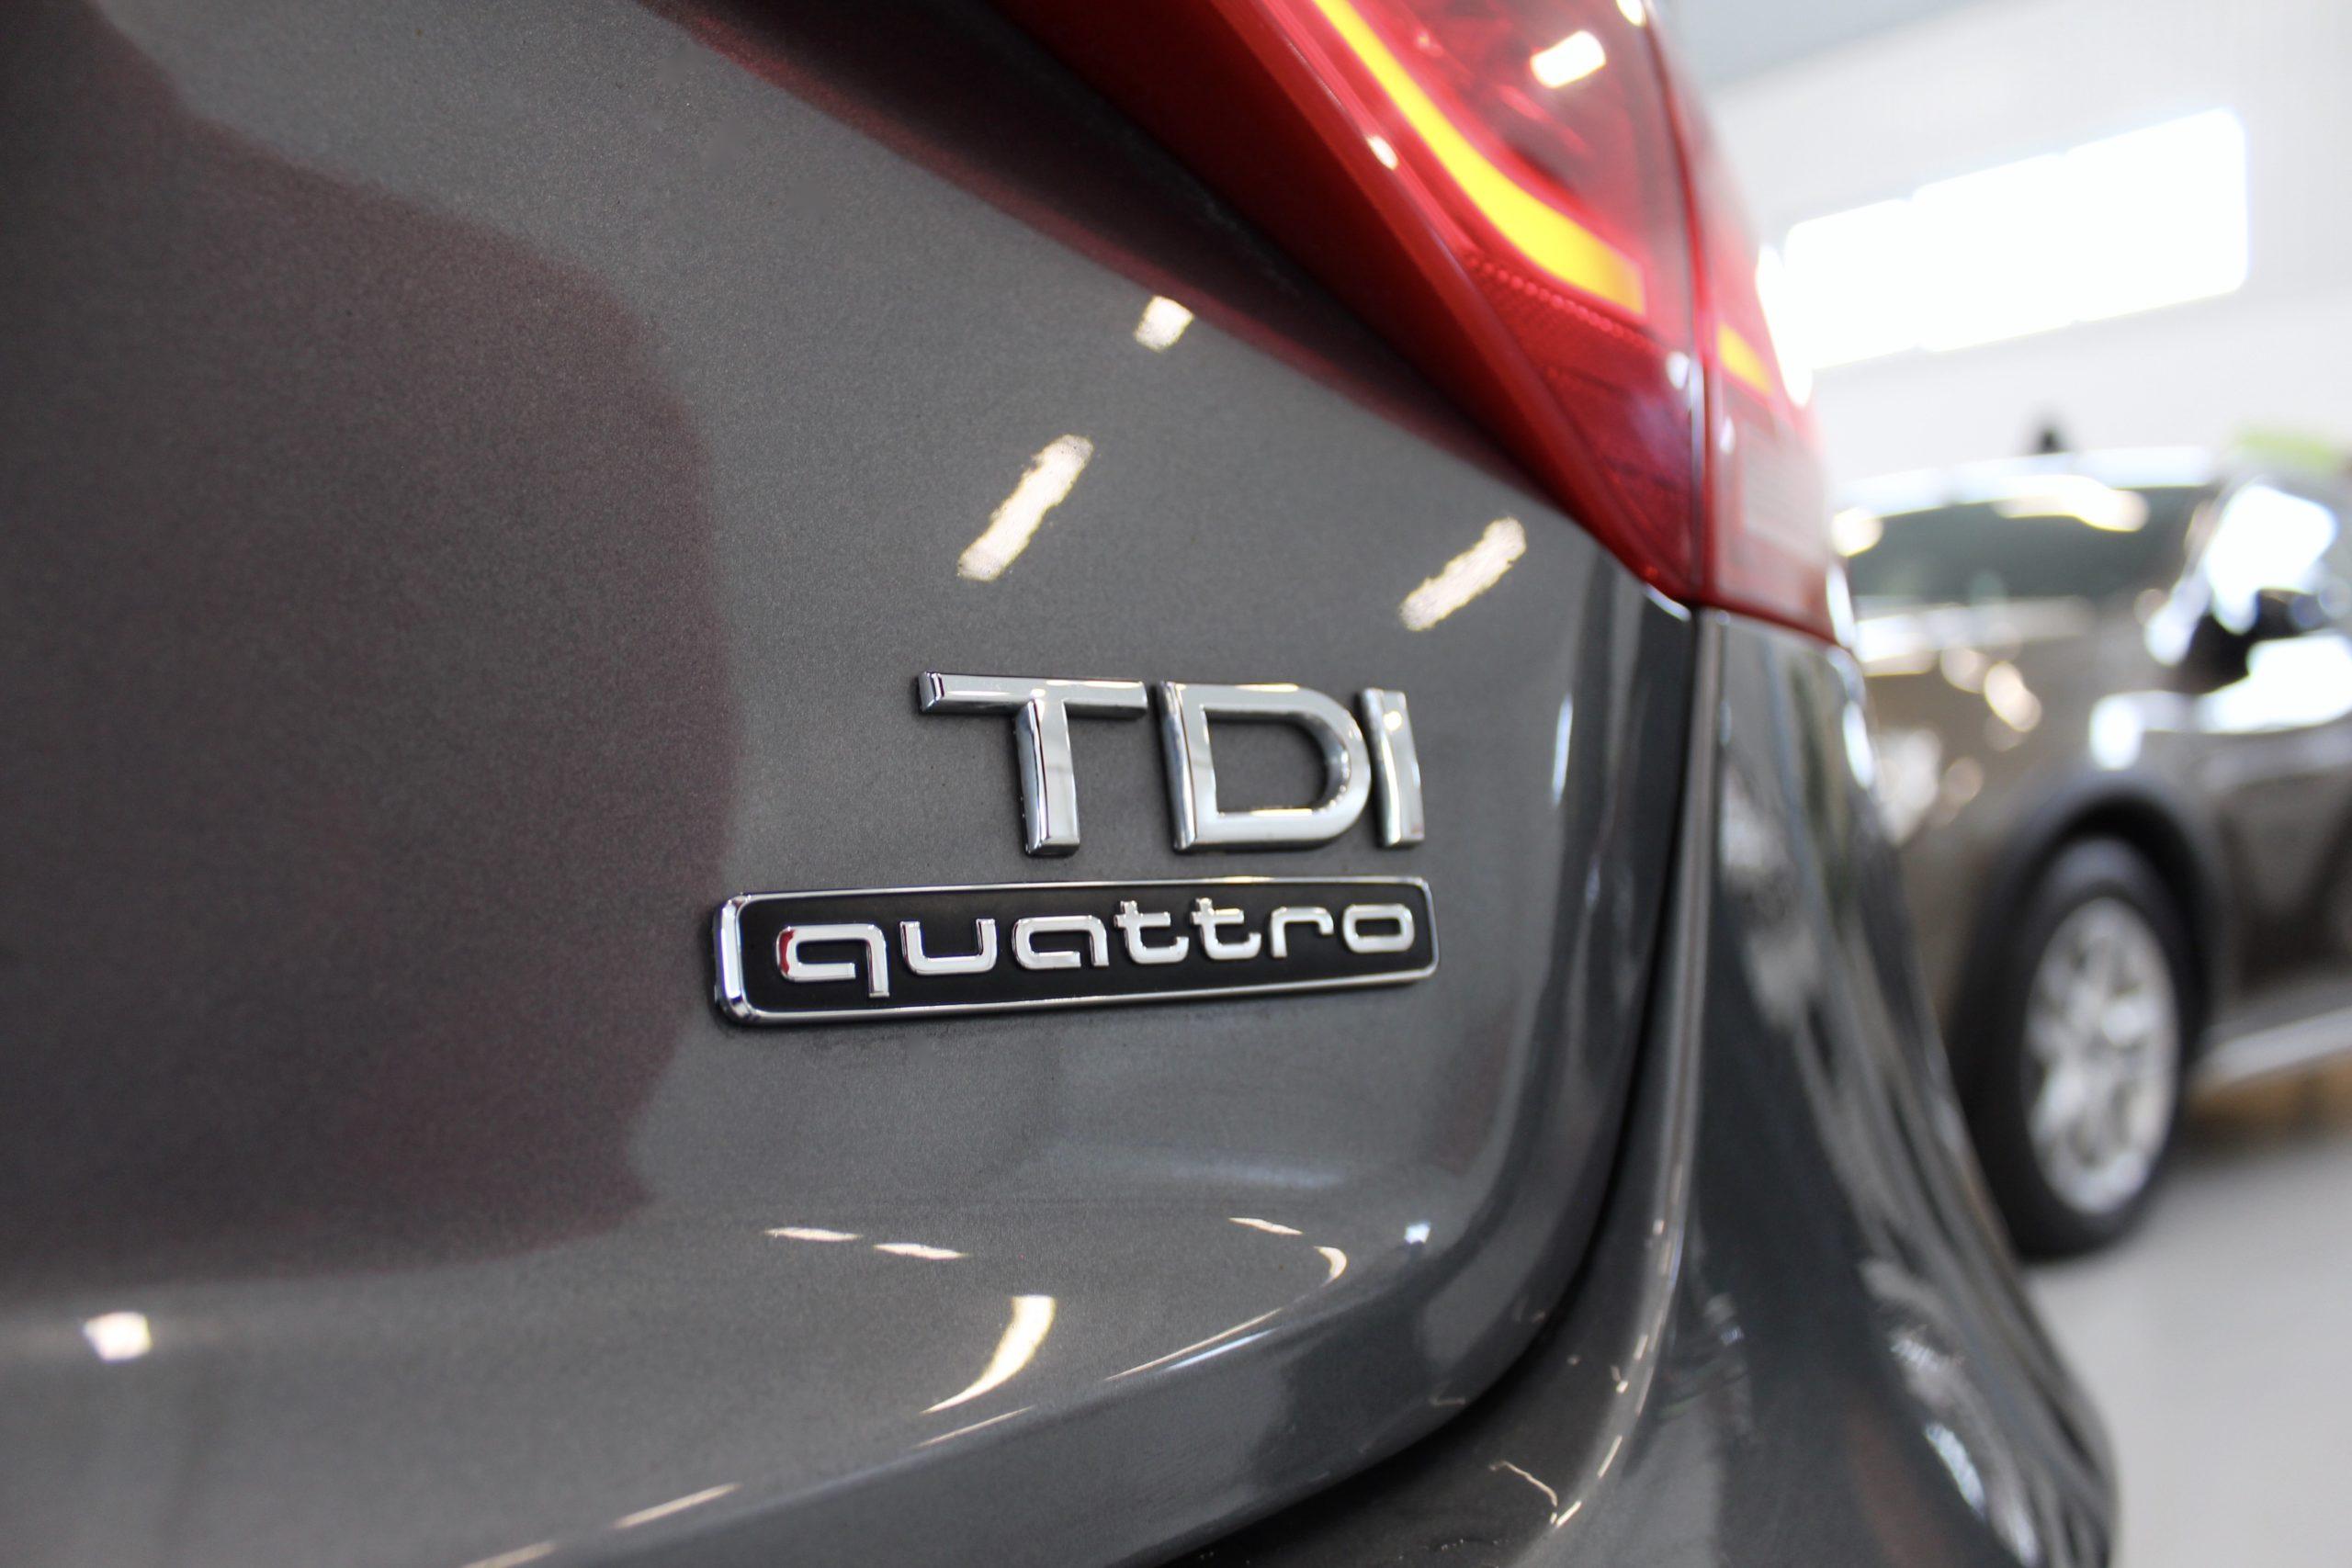 Audi A5 2.0 TDI Quattro Proline Alpine Edition 190hk